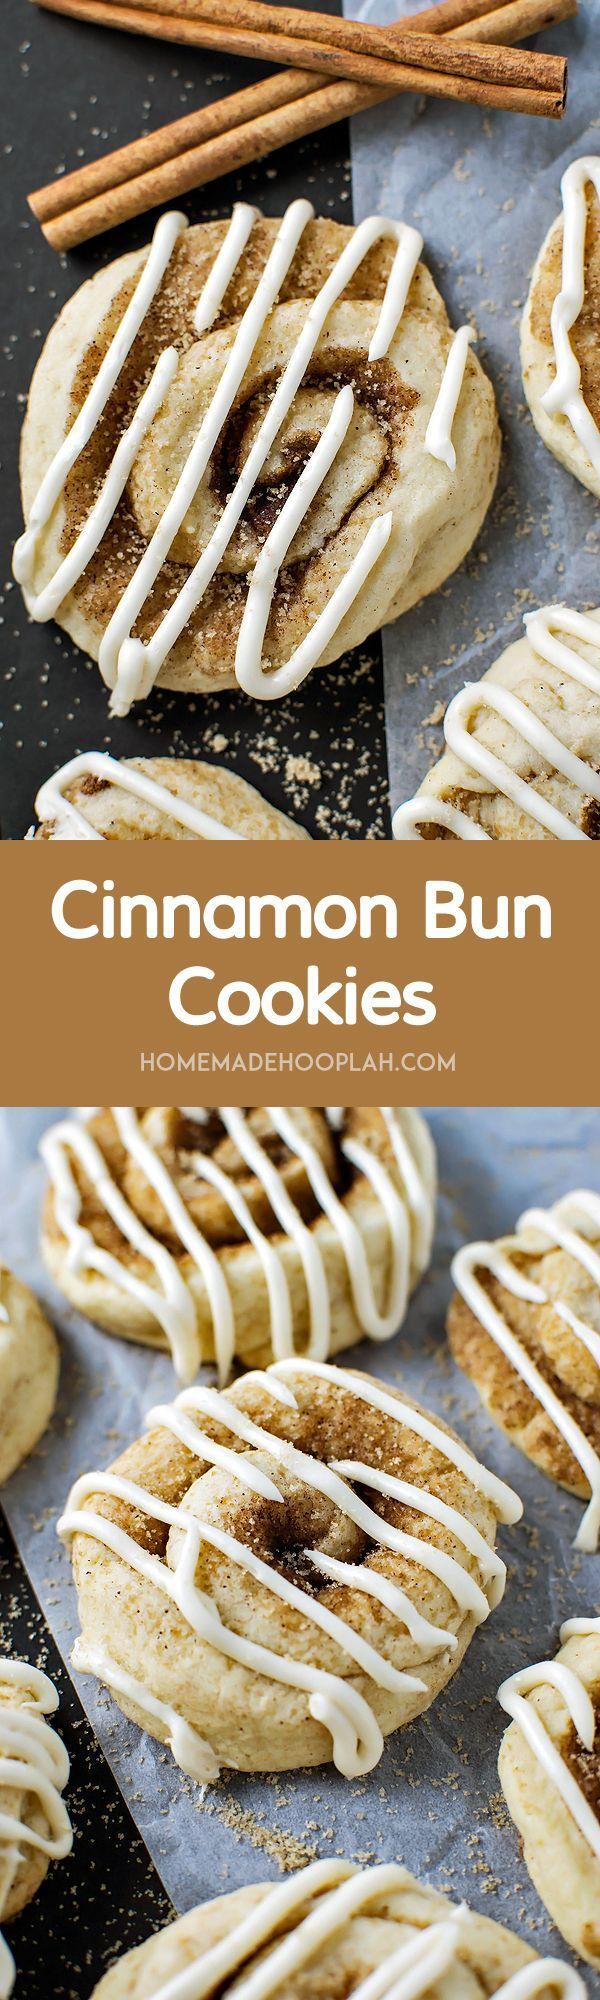 1000+ ideas about Cinnamon Bun Recipe on Pinterest | Bun ...